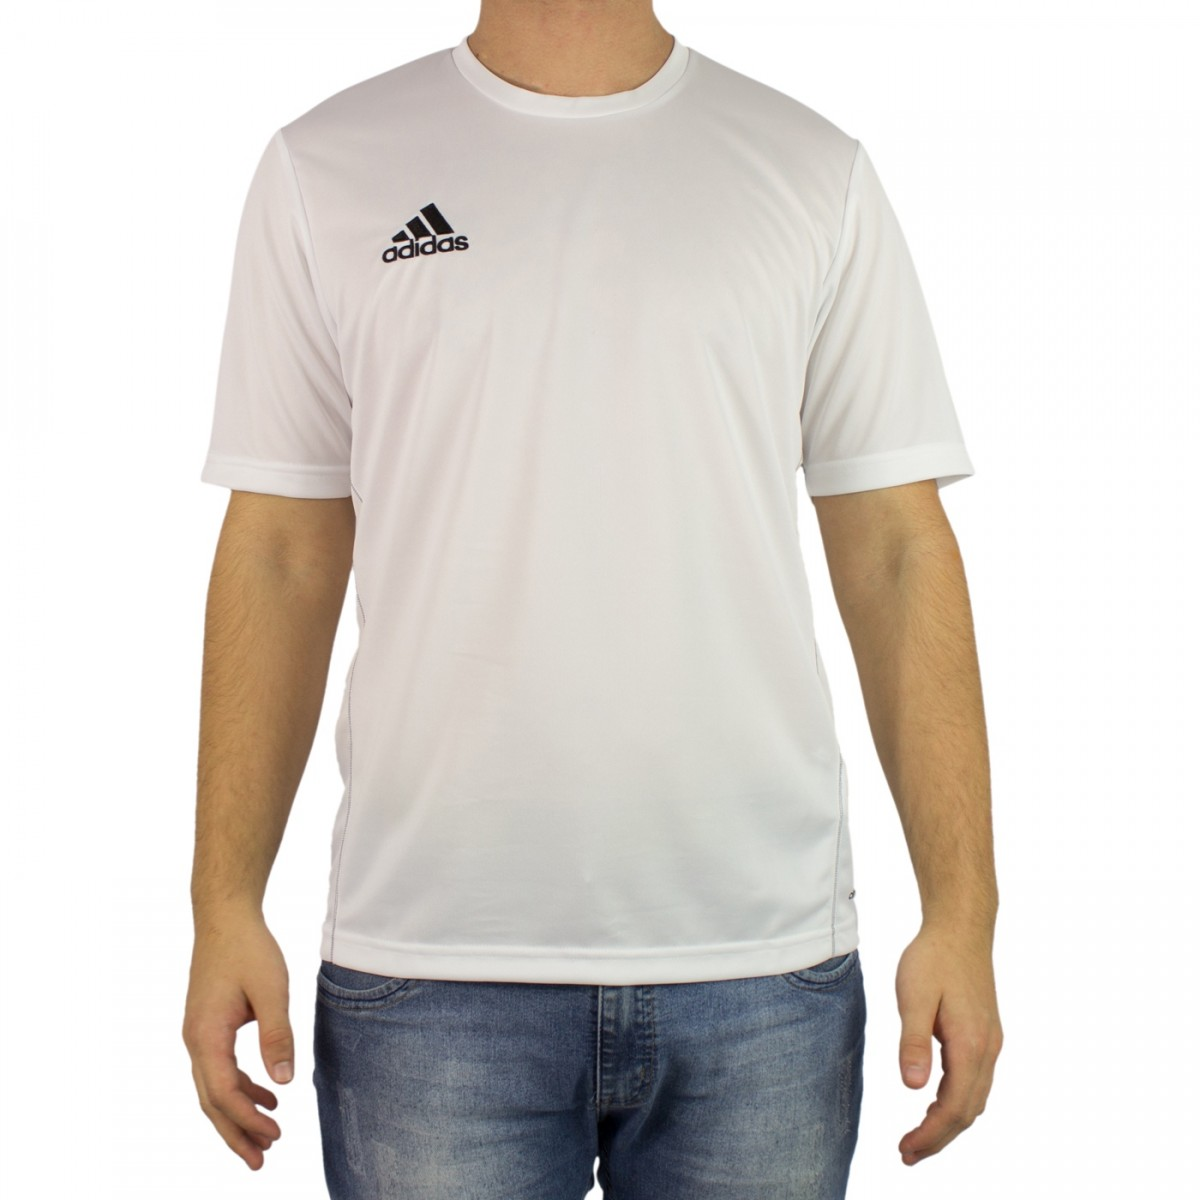 Bizz Store - Camiseta Masculina Adidas Core 15 Cinza Treino a234cf6deeb